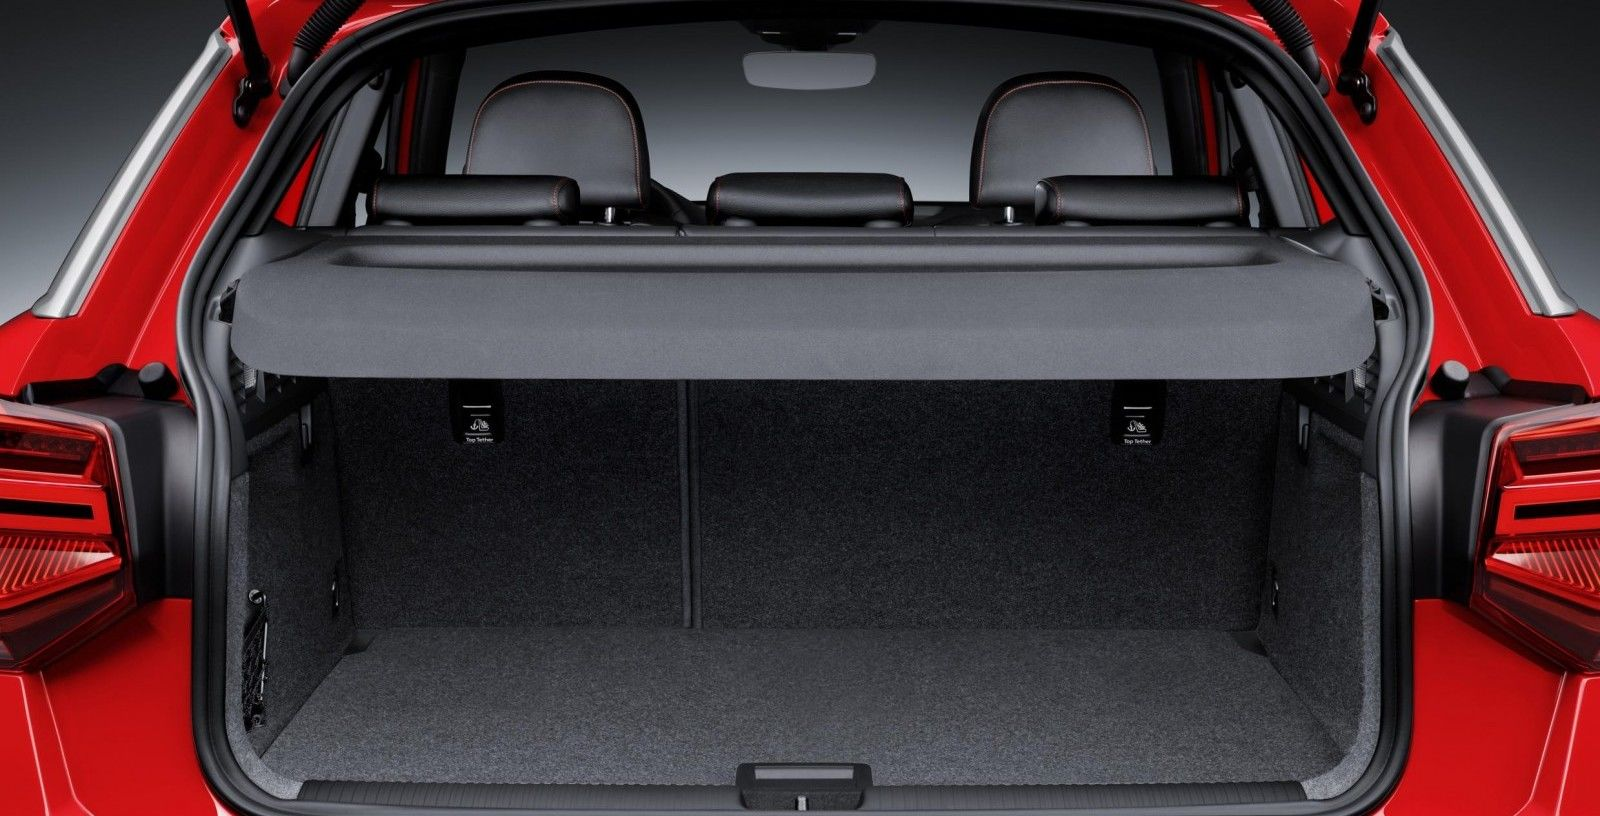 Audi q3 boot dimensions